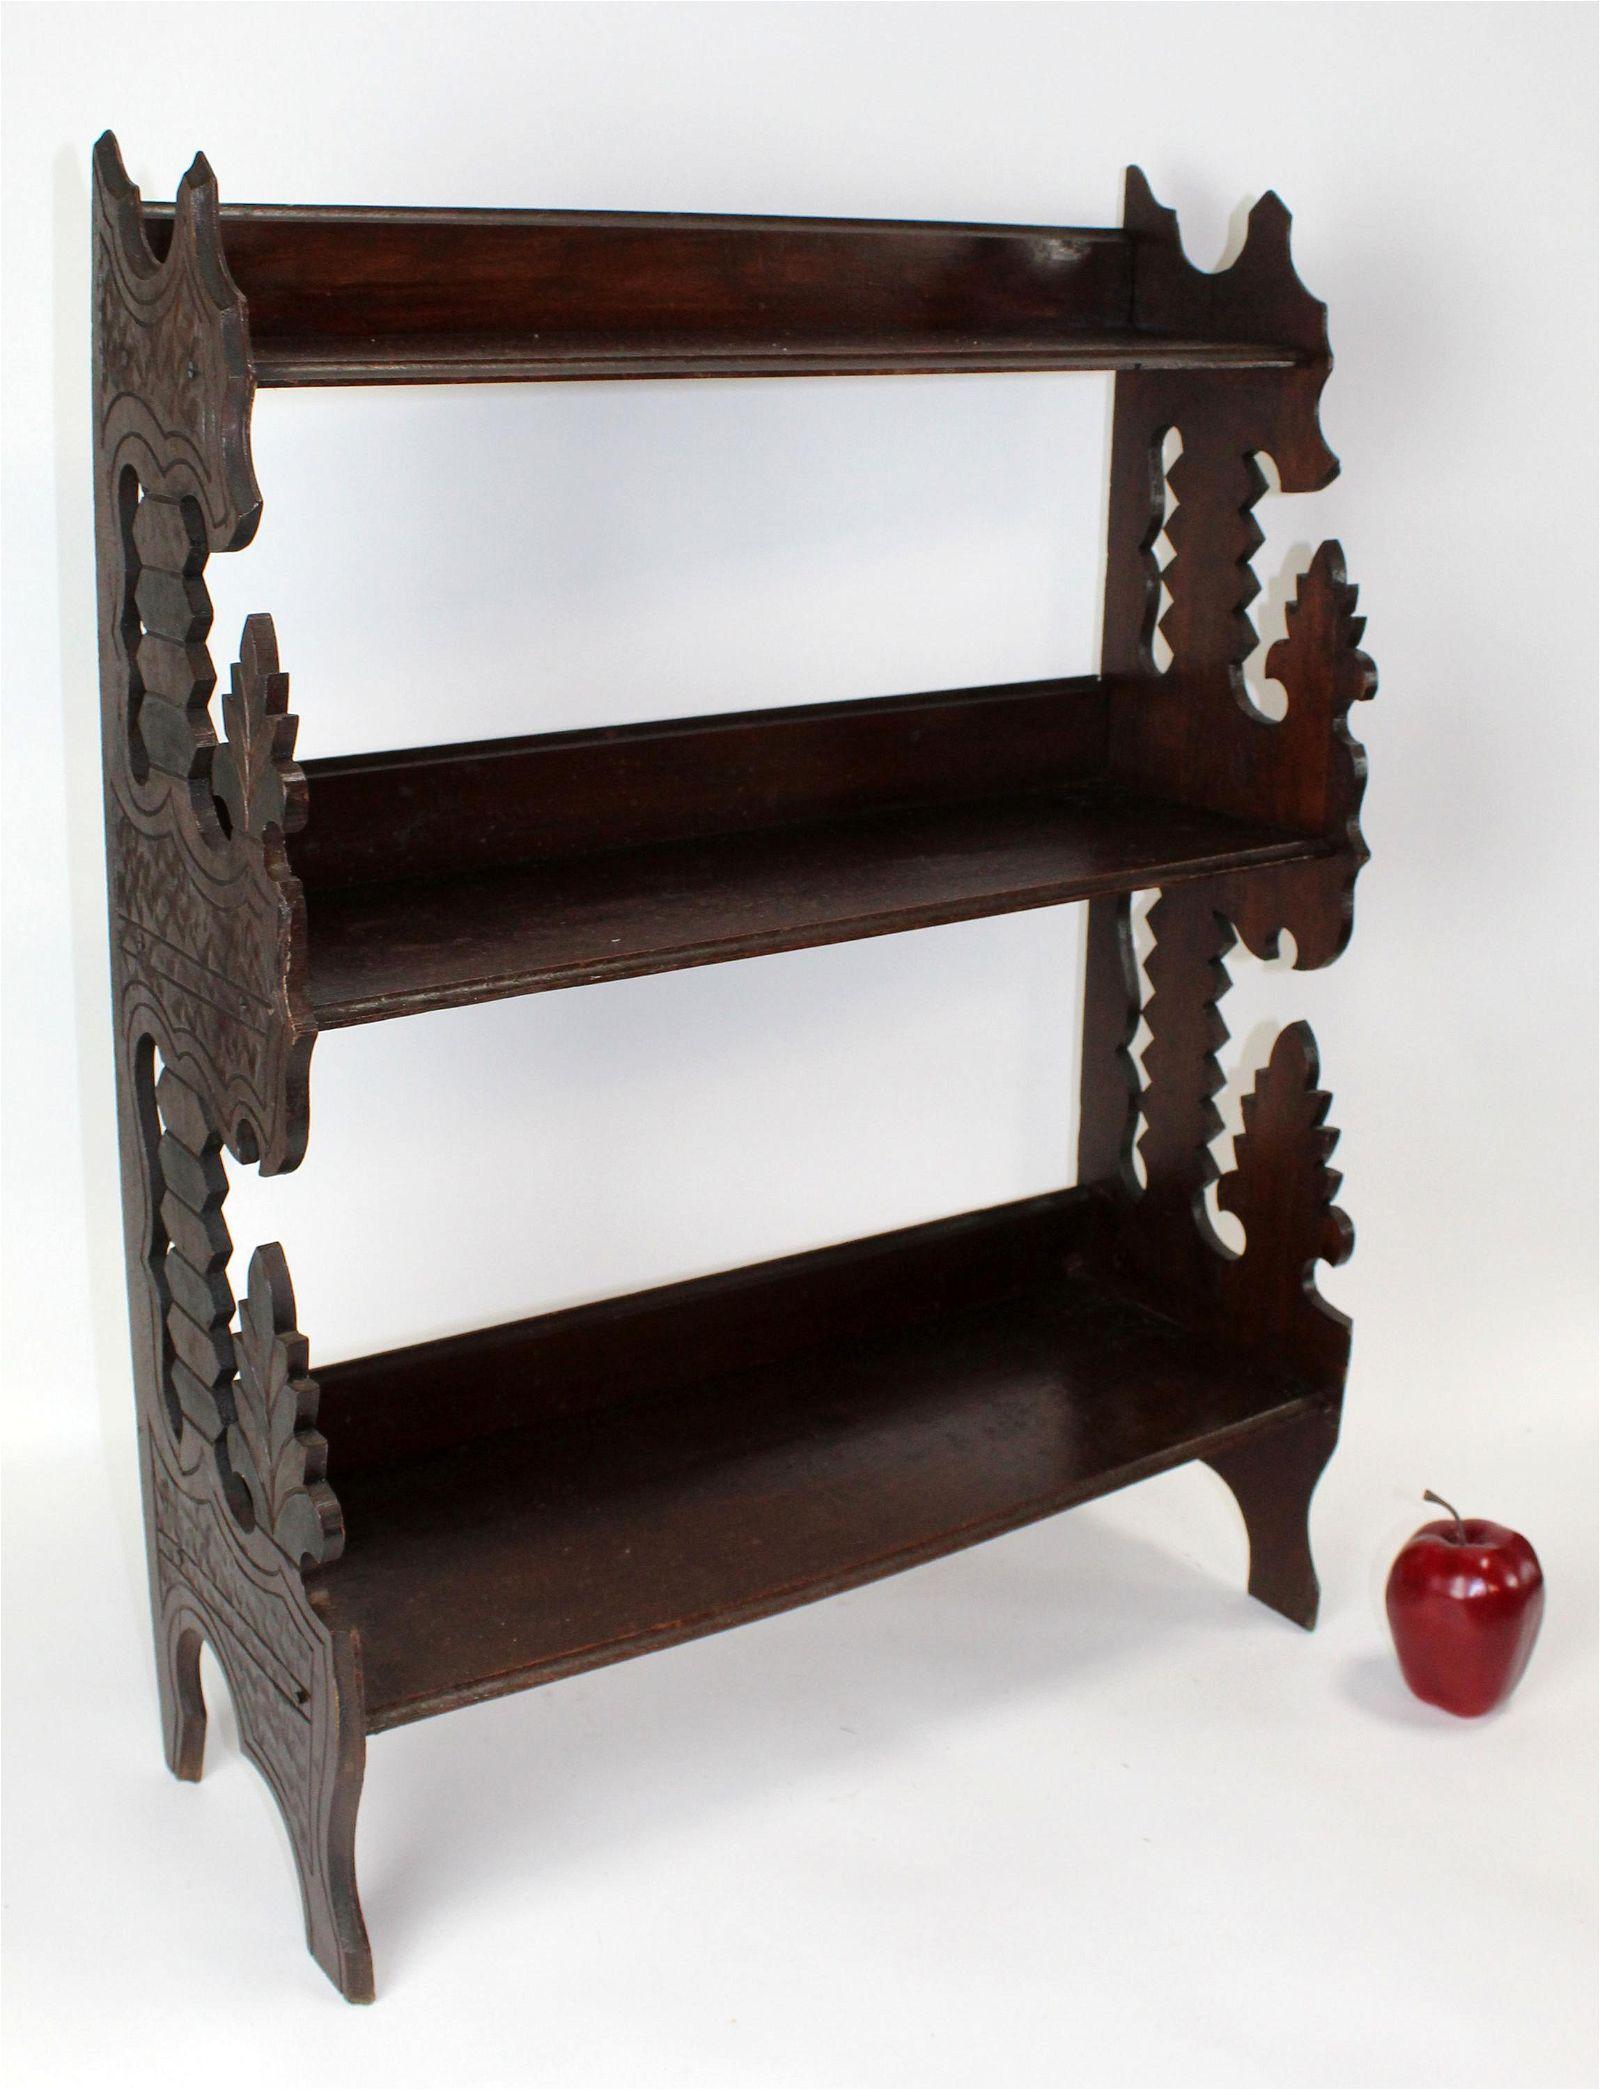 Black Forest style wall mount etagere shelf